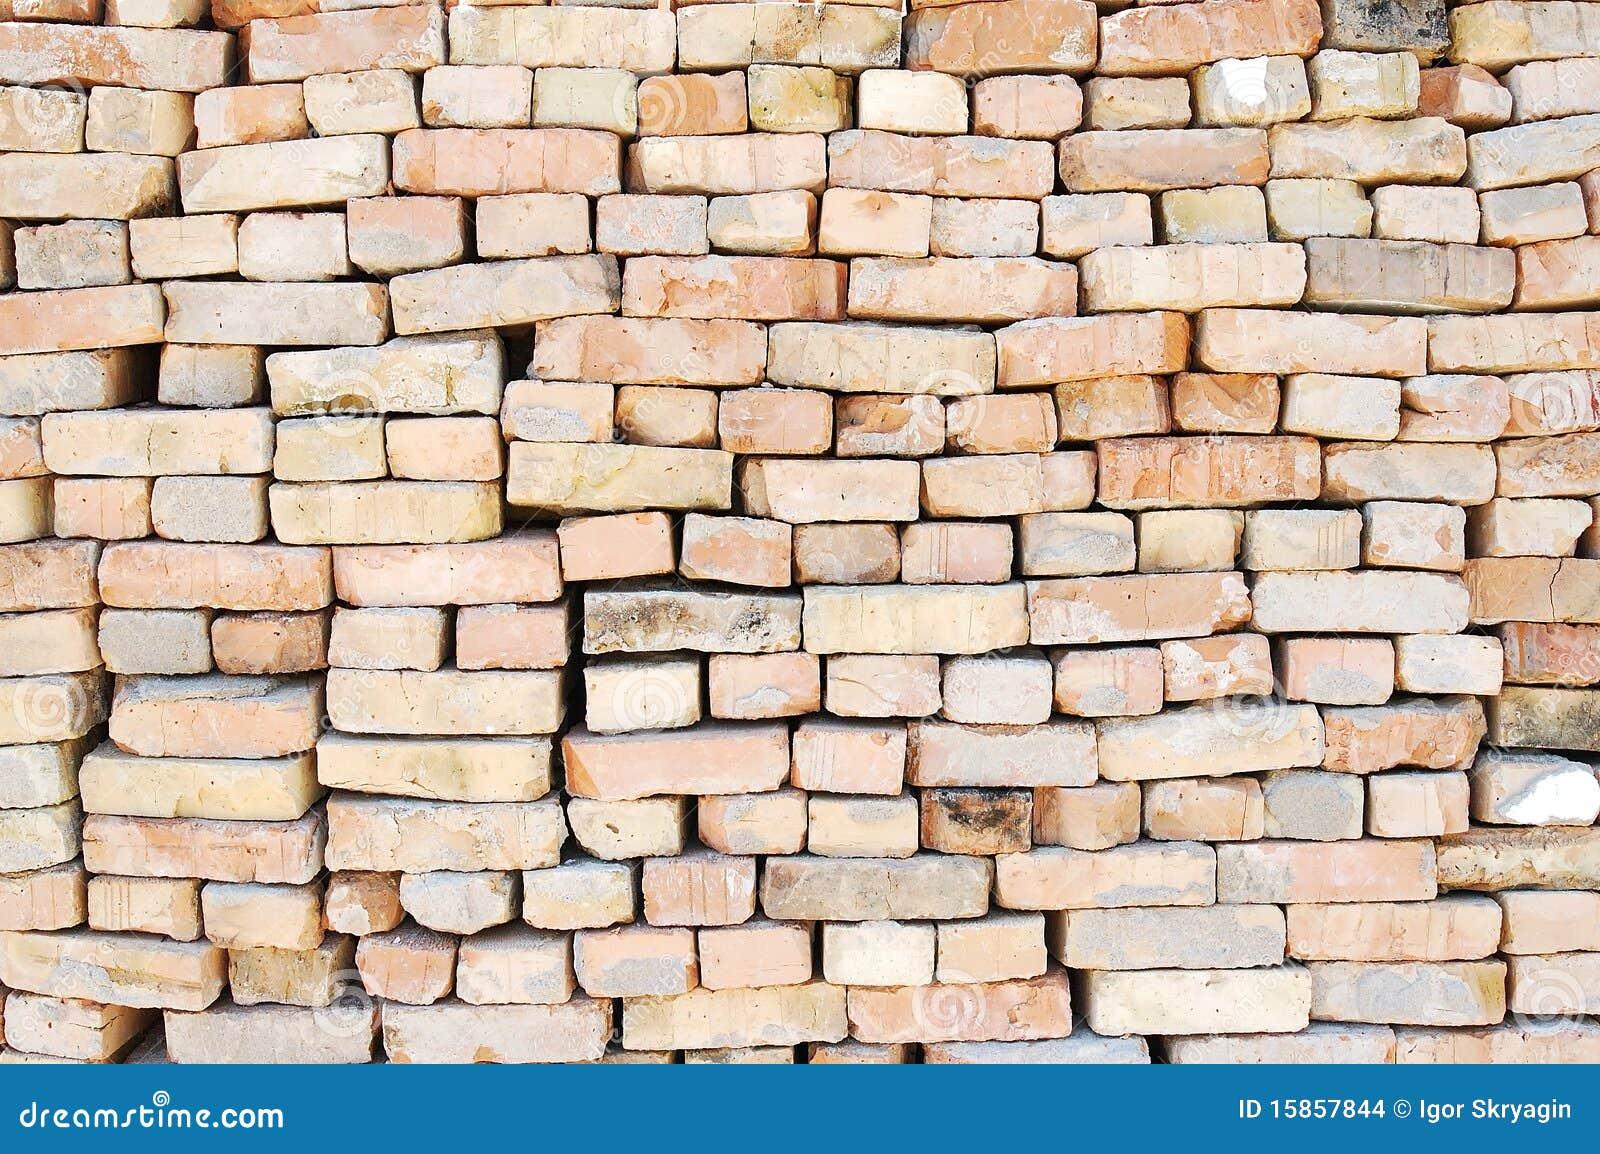 Wall from old bricks